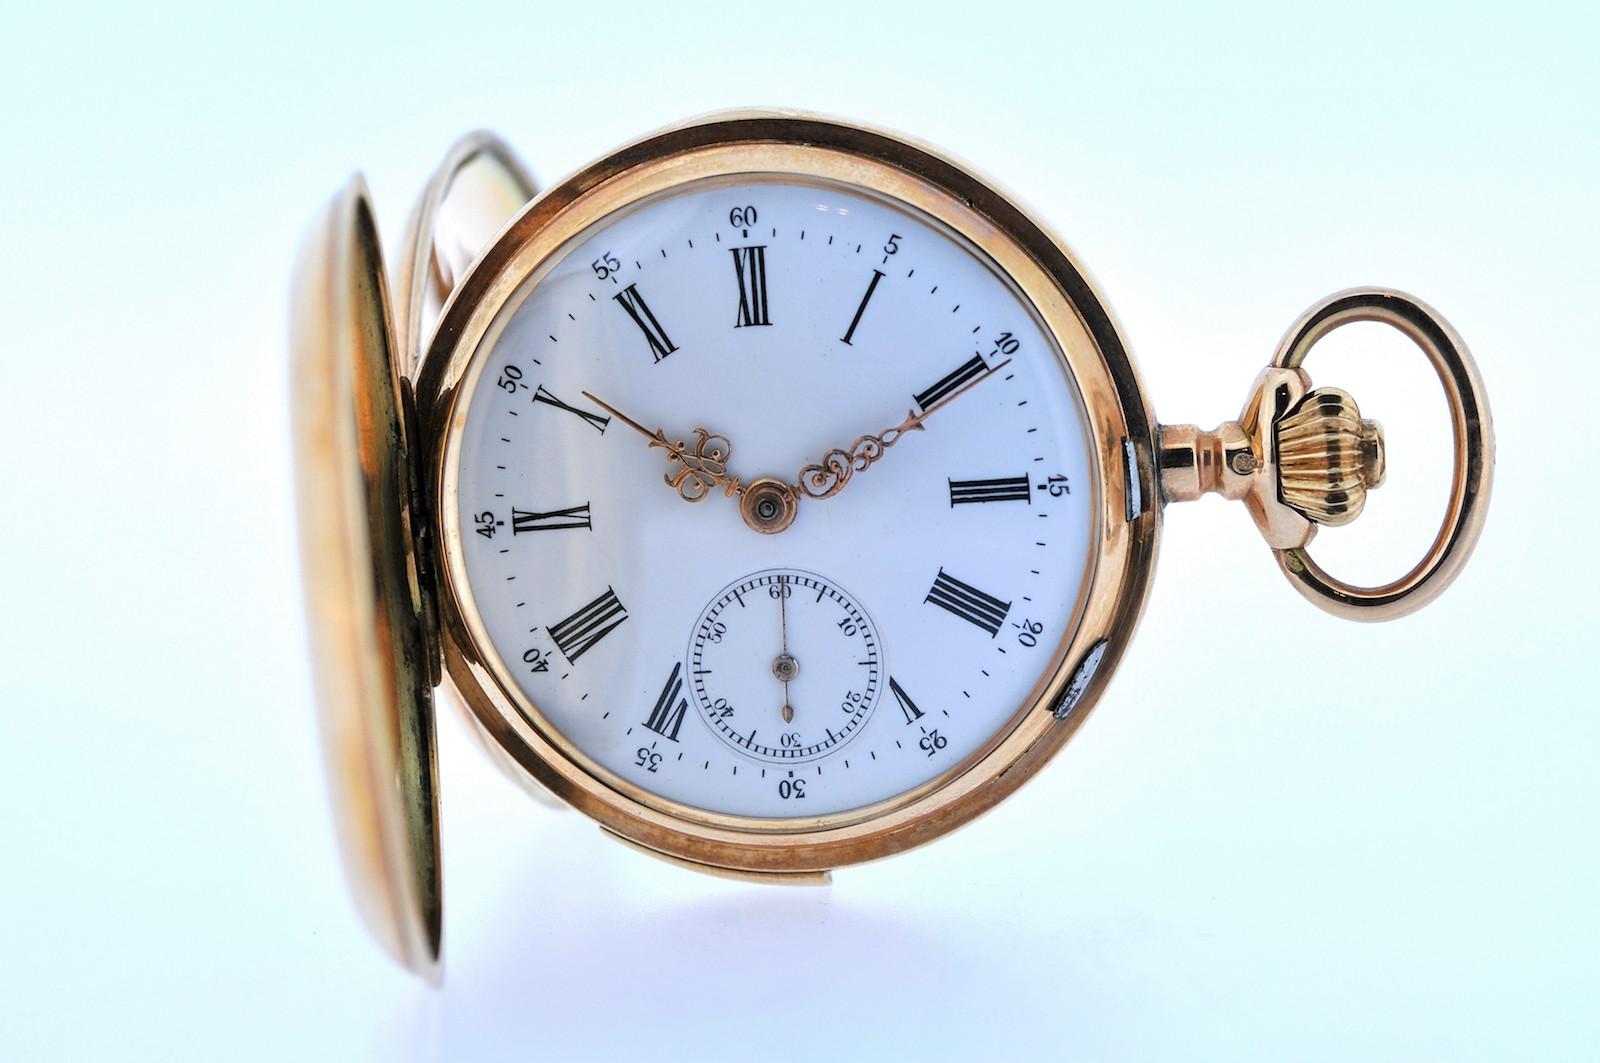 #26 Quarter Hours Repeating Watch | Viertelstundenrepetierer Image